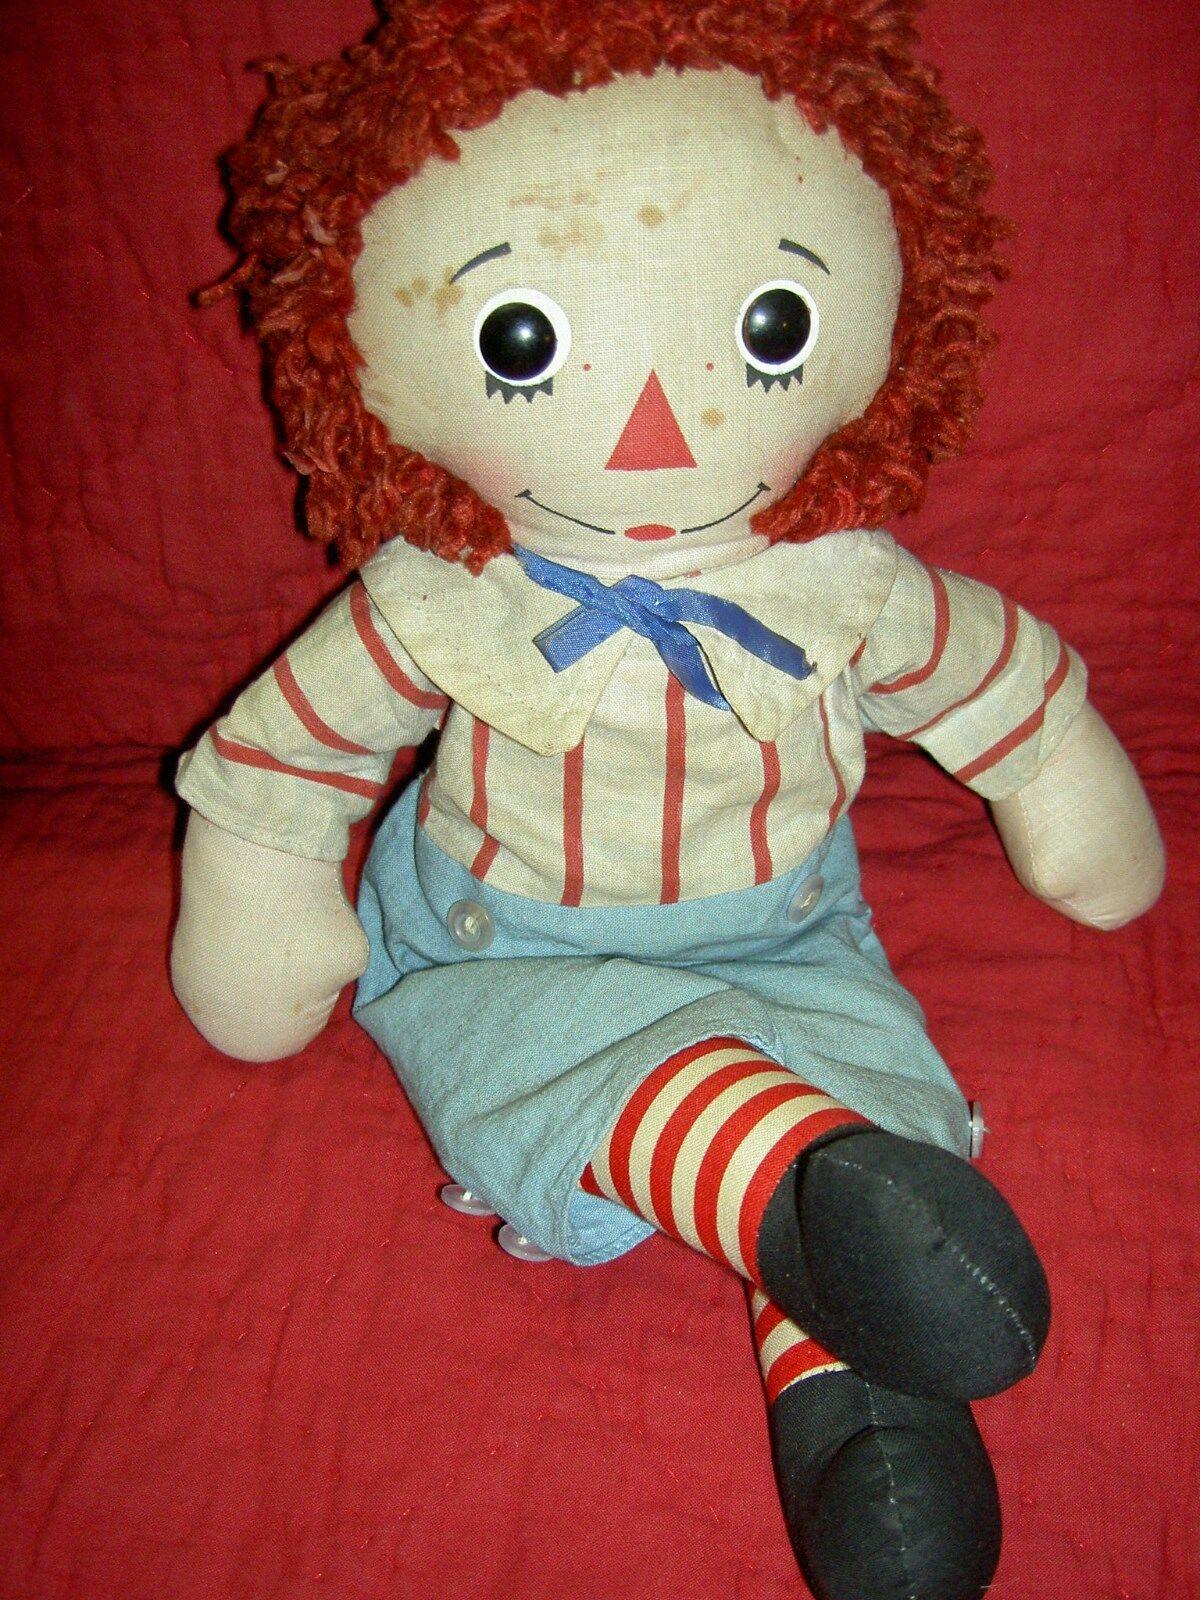 15  largo, Vintage 1976 Paño  Raggedy Andy  (Etiqueta) LIMITED muñeca Knickerbocker